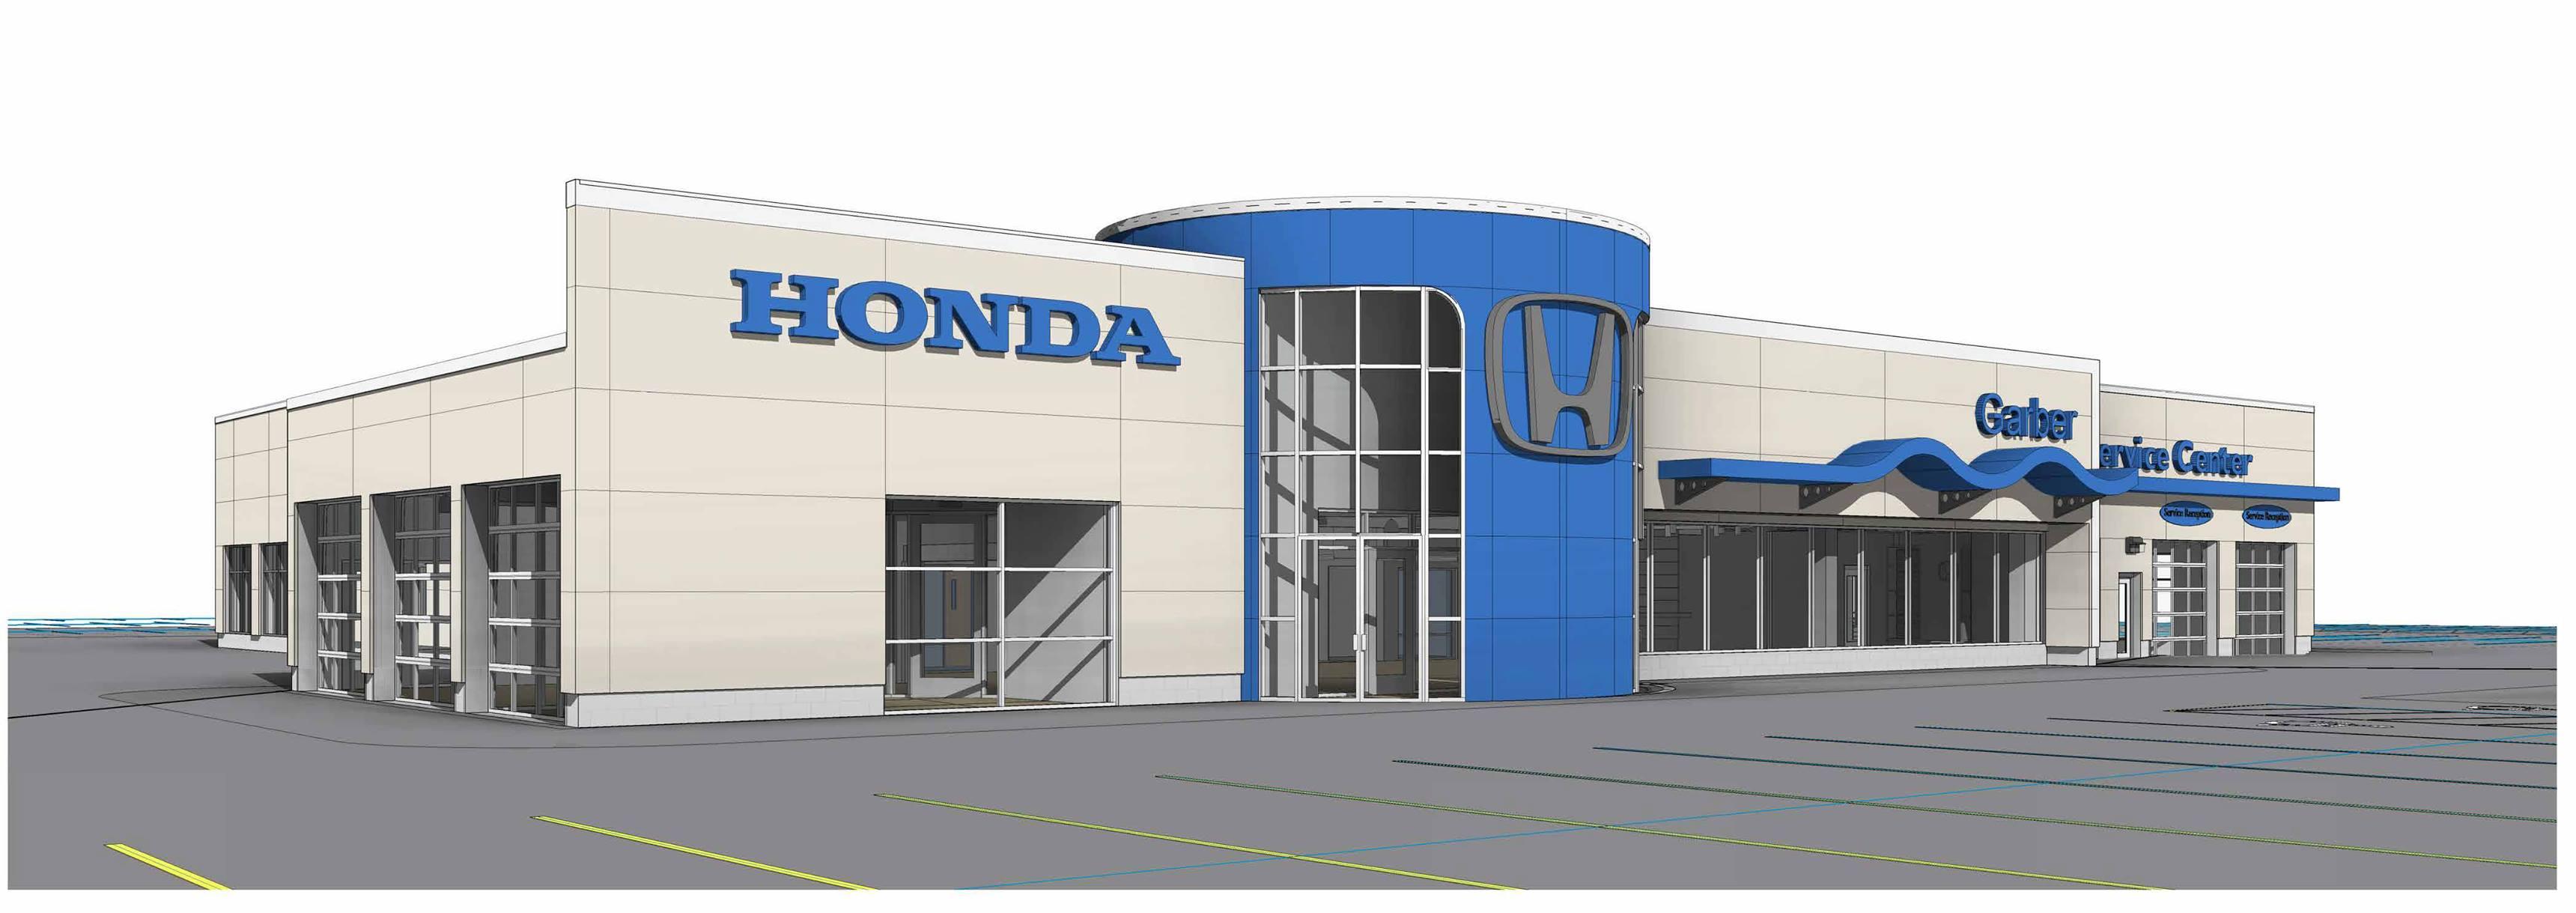 Garber honda sales service new faculities in rochester ny for Atlanta area honda dealers